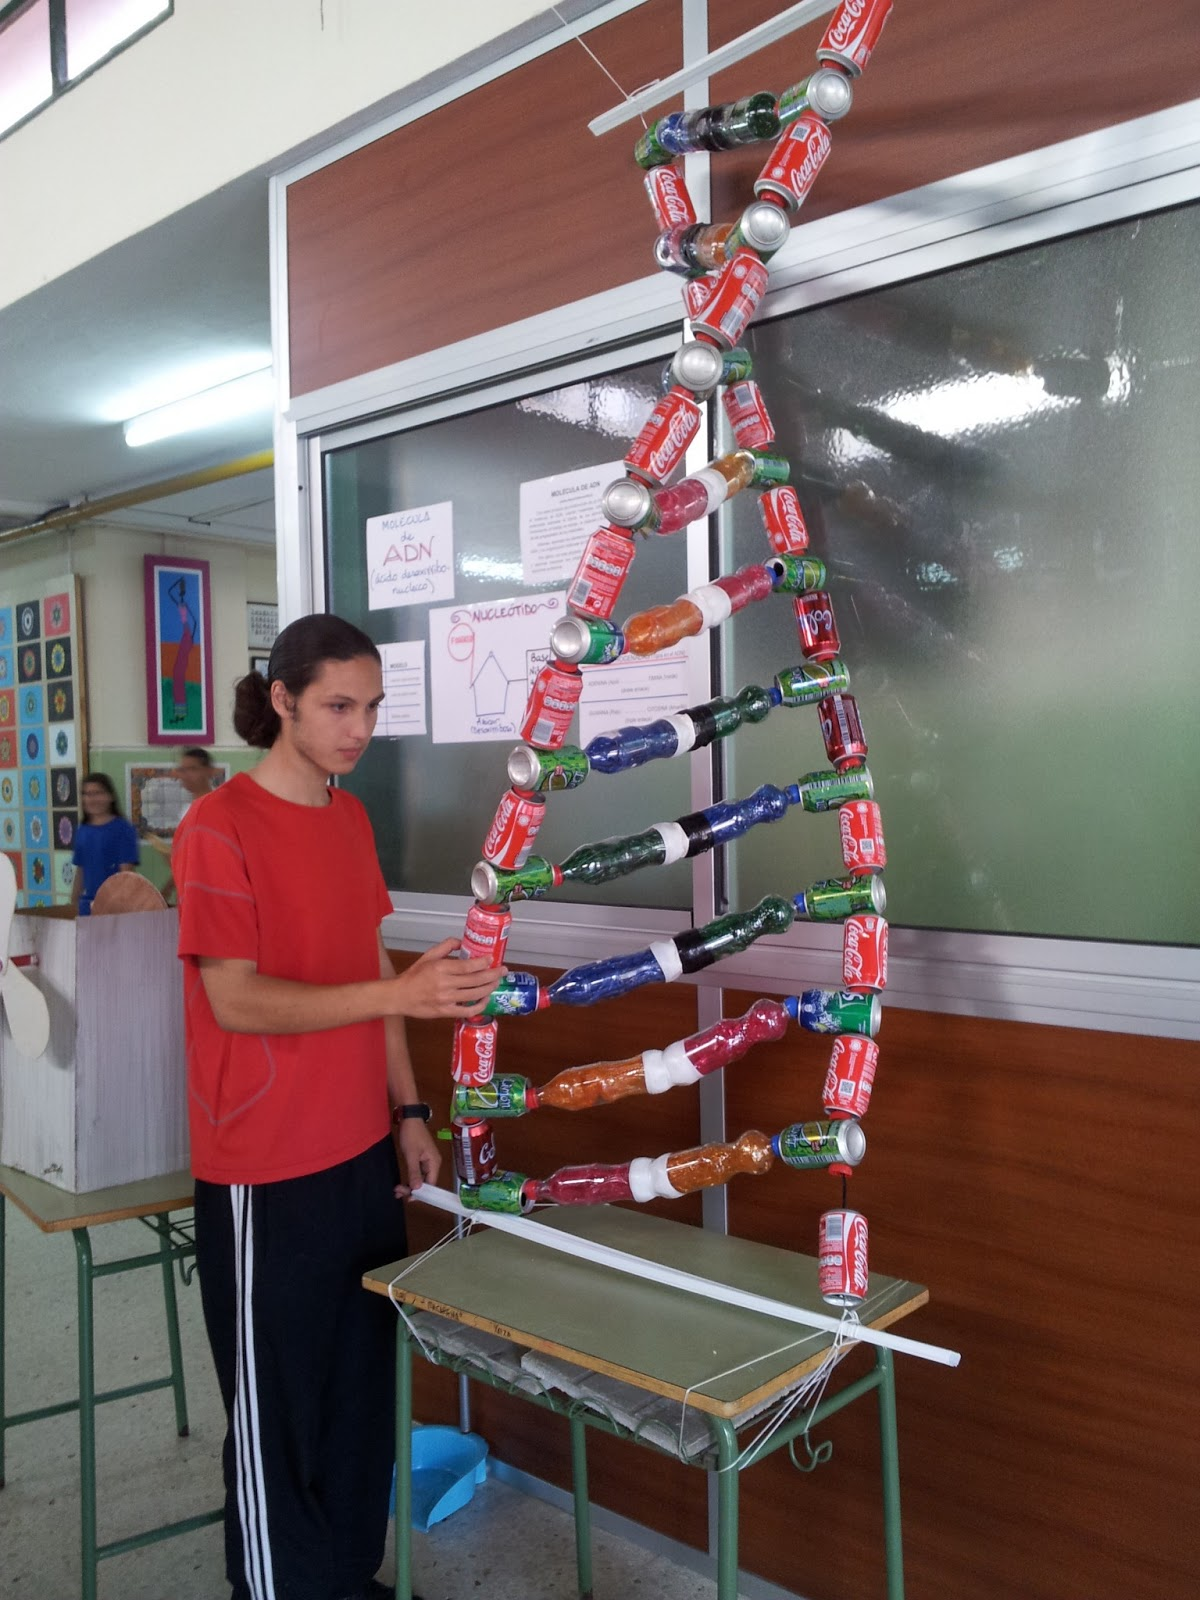 RESIDUOS: Modelo de doble hélice de ADN usando materiales reciclados